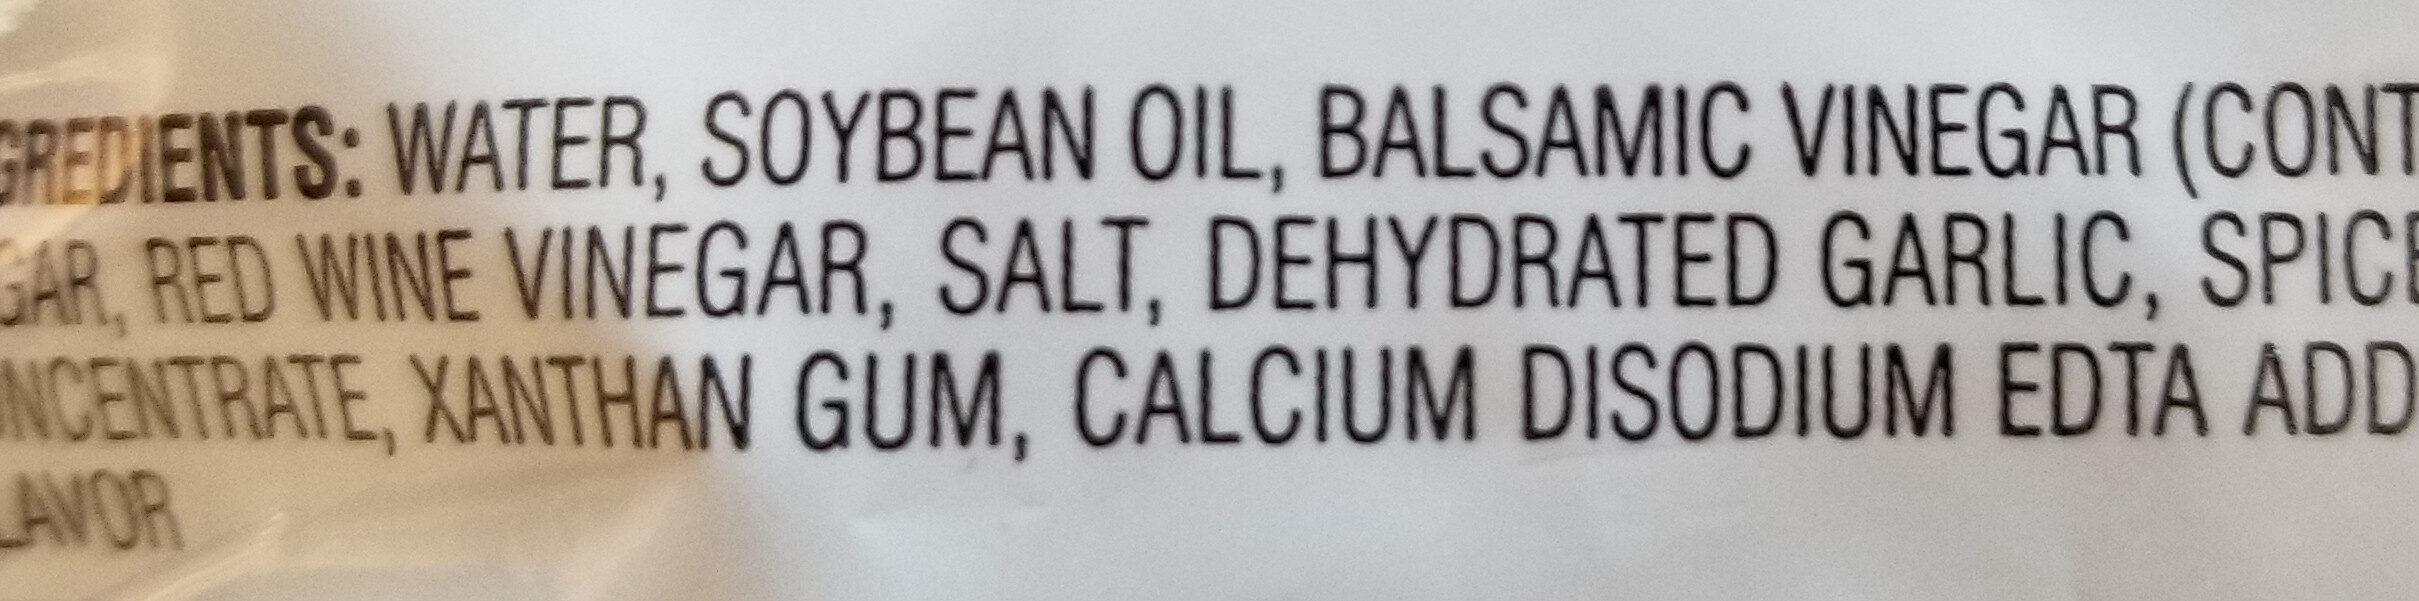 Gluten free balsamic vinaigrette - Ingredients - en